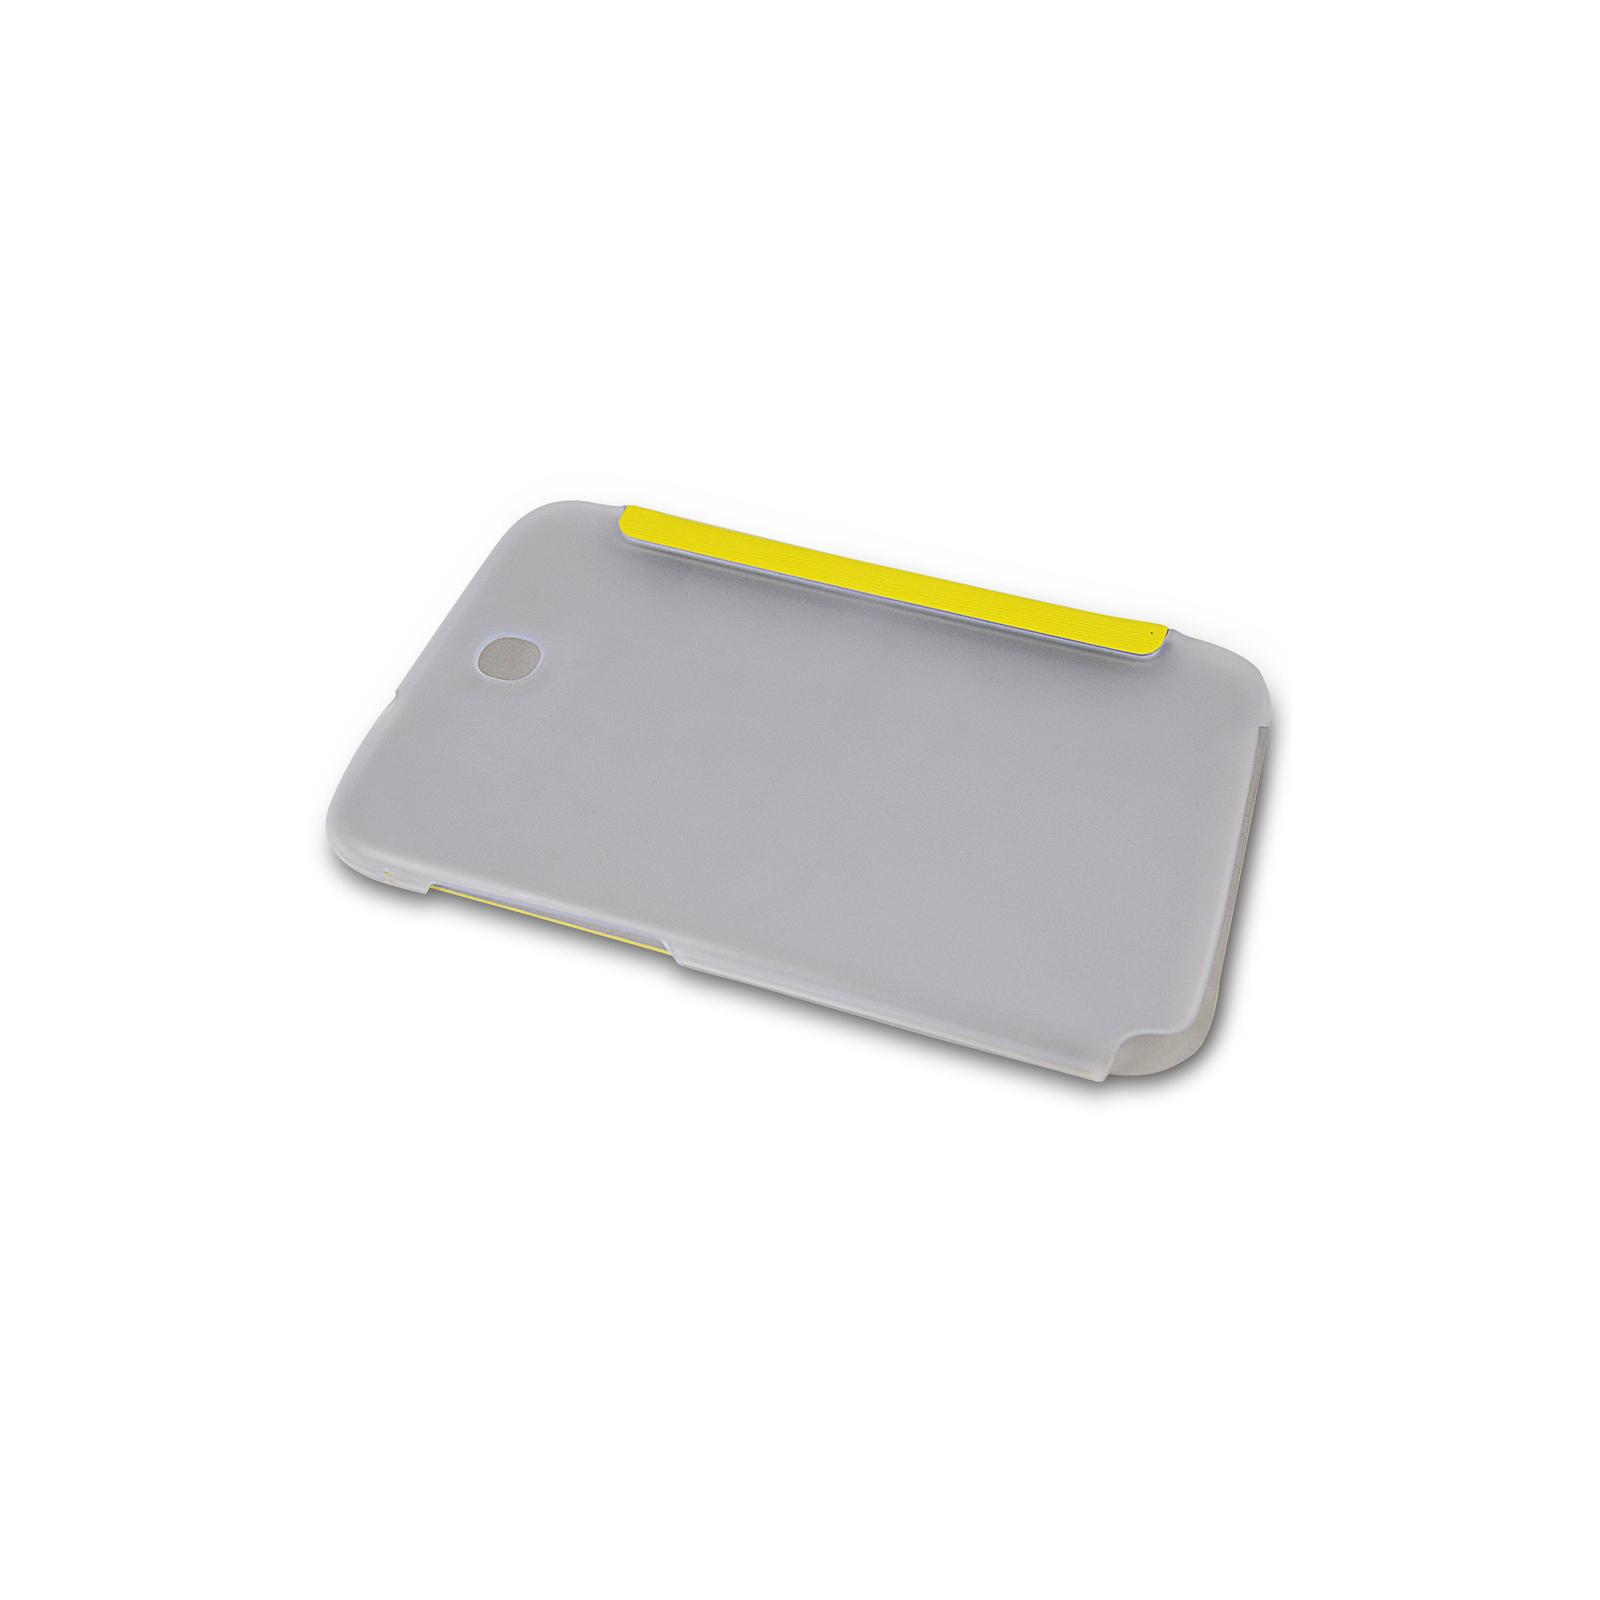 "Чехол для планшета Rock 8"" Rock Samsung Note 8.0 N5100 new elegant series lemon yell (6950290628306) изображение 2"